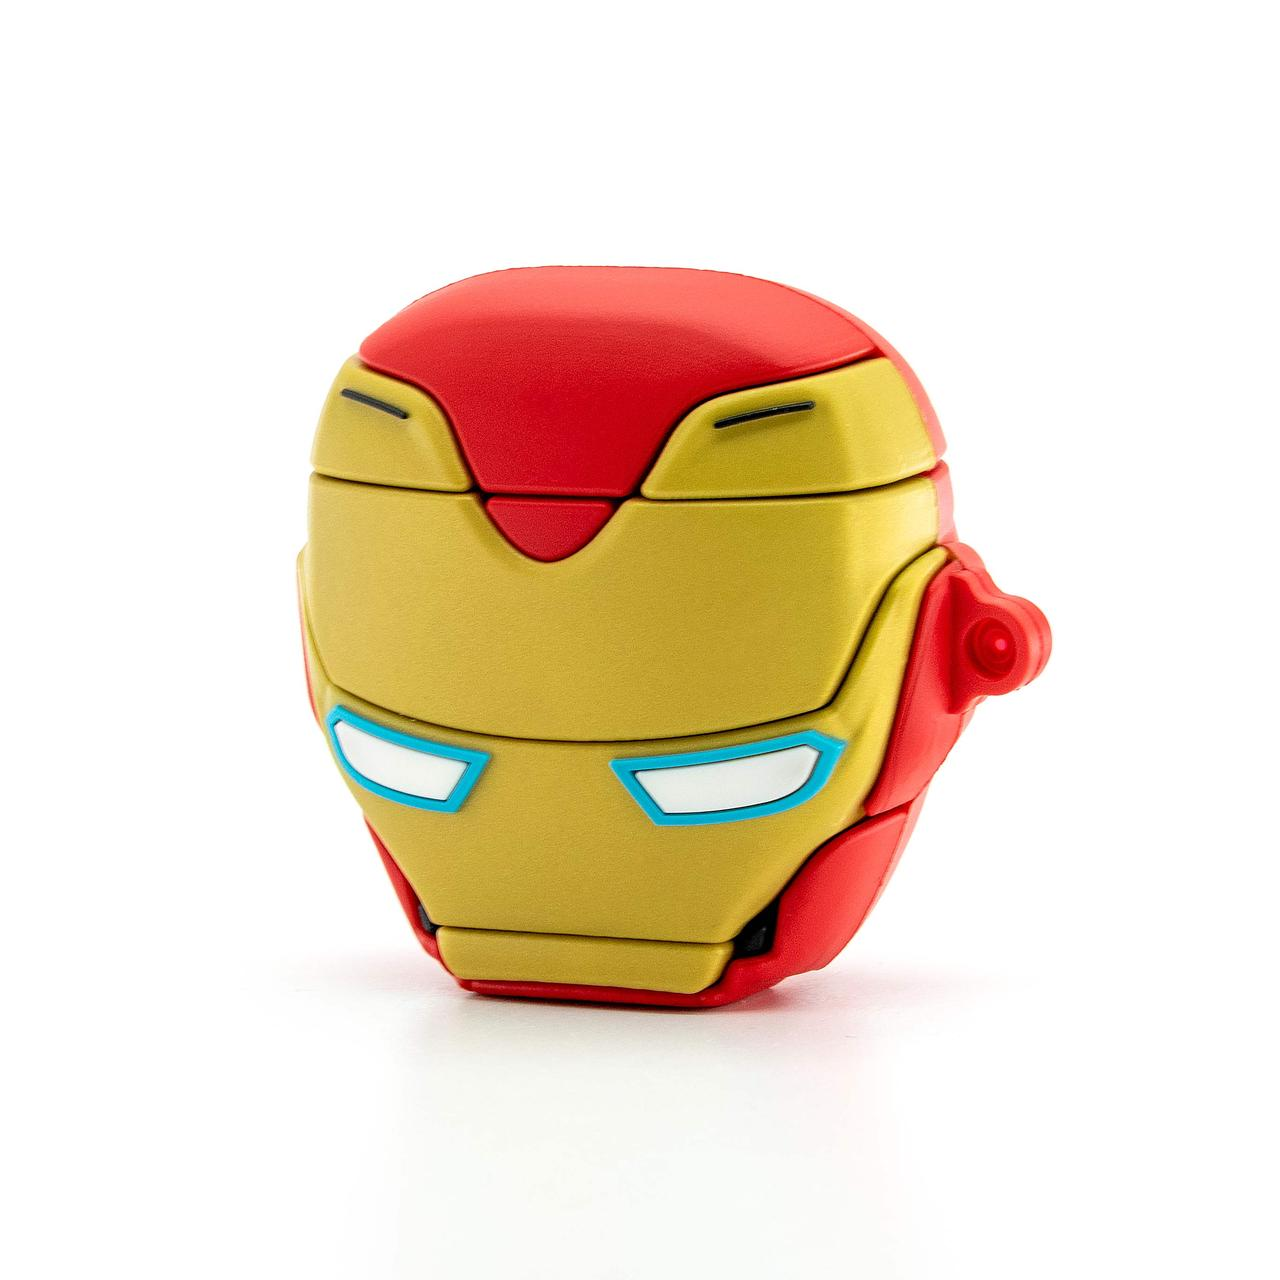 Airpods чехол 1/2 - Iron man